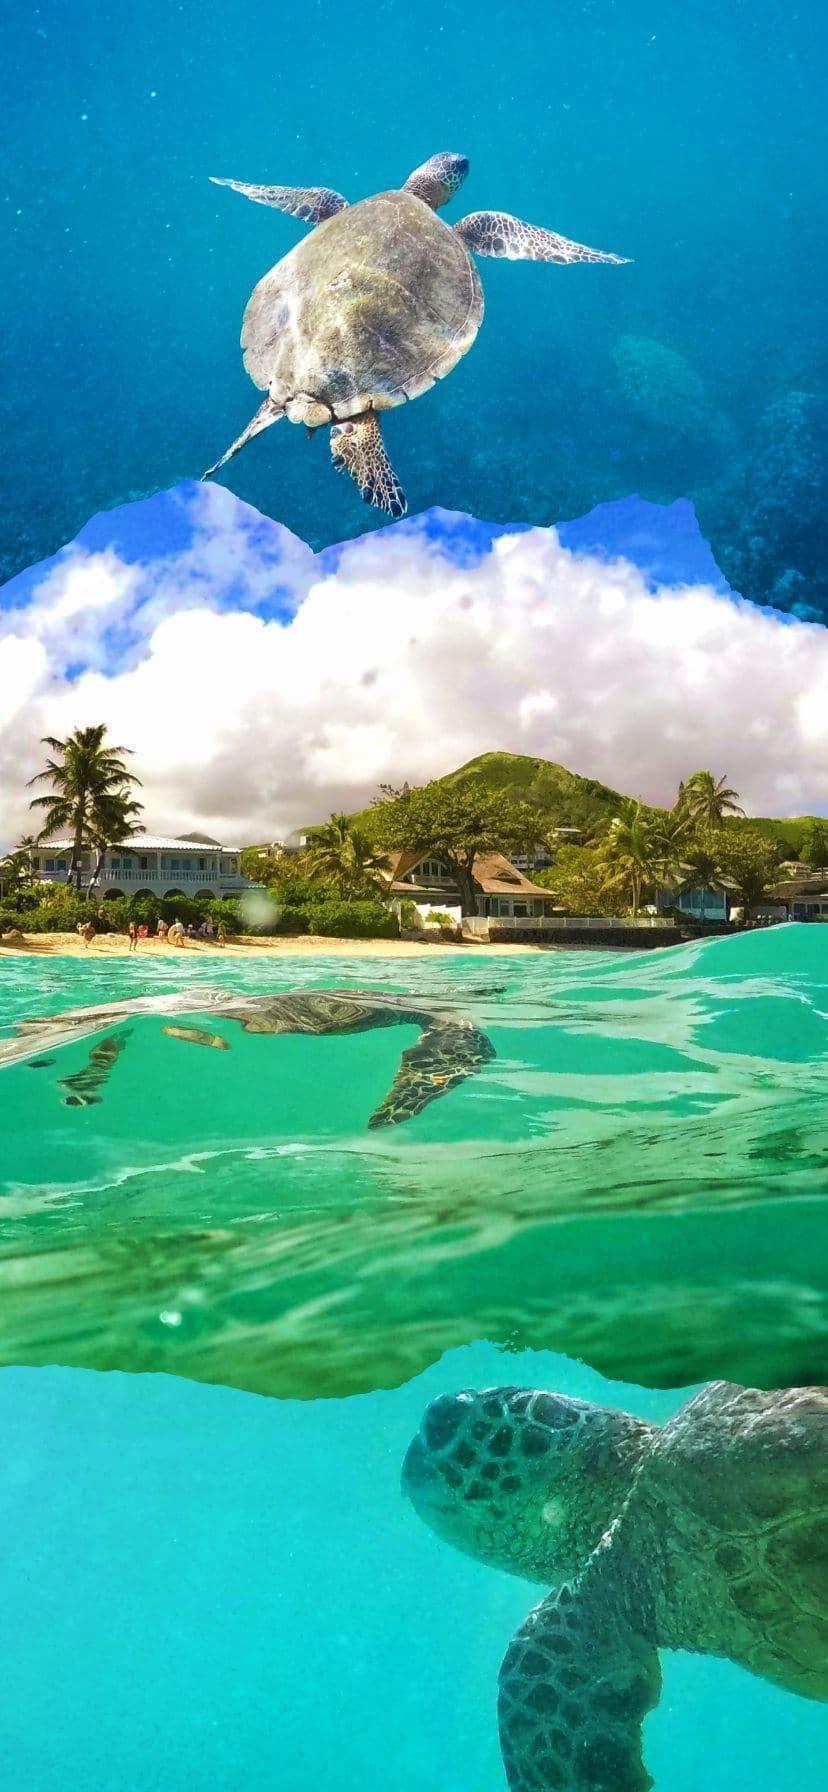 Hawaiian Green Sea Turtle Honu at Lanikai Oahu